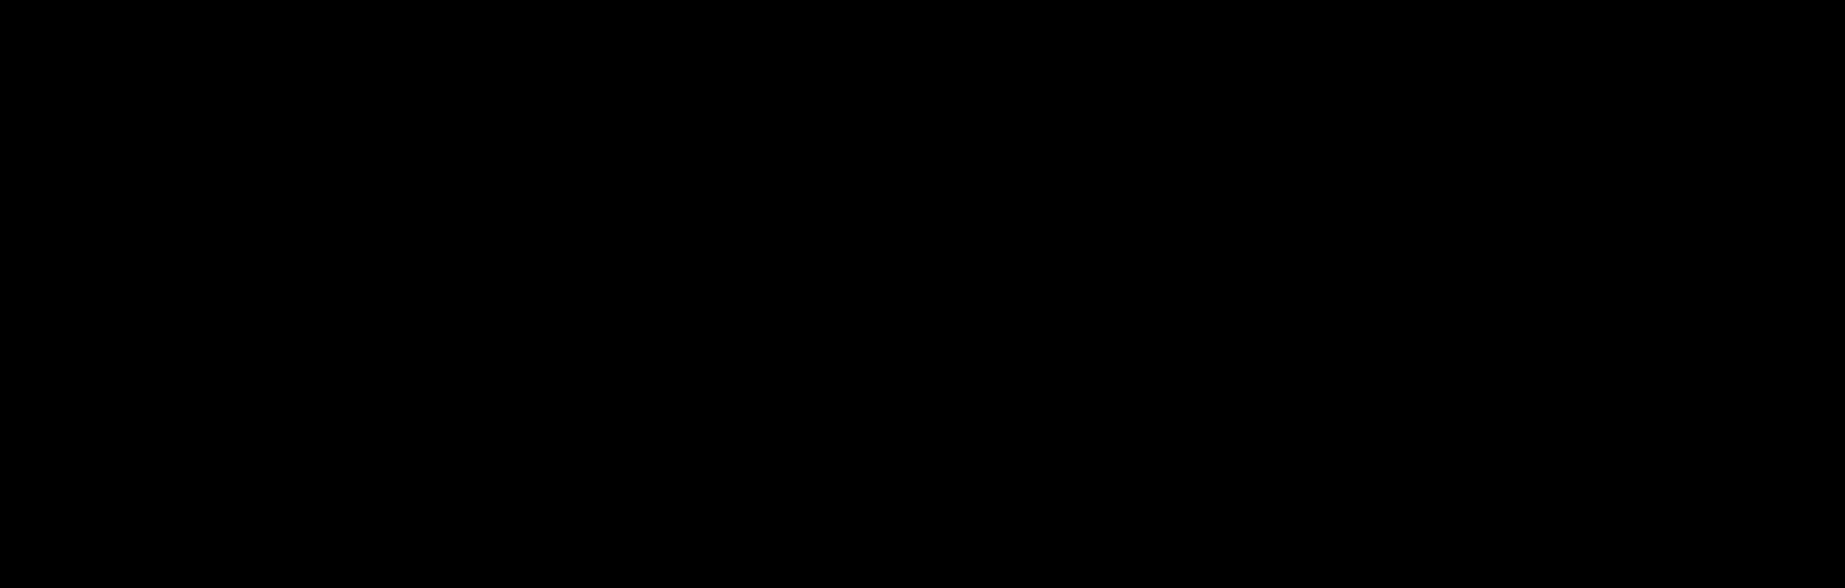 Amisulpride-d<sub>5</sub> EP impurity G